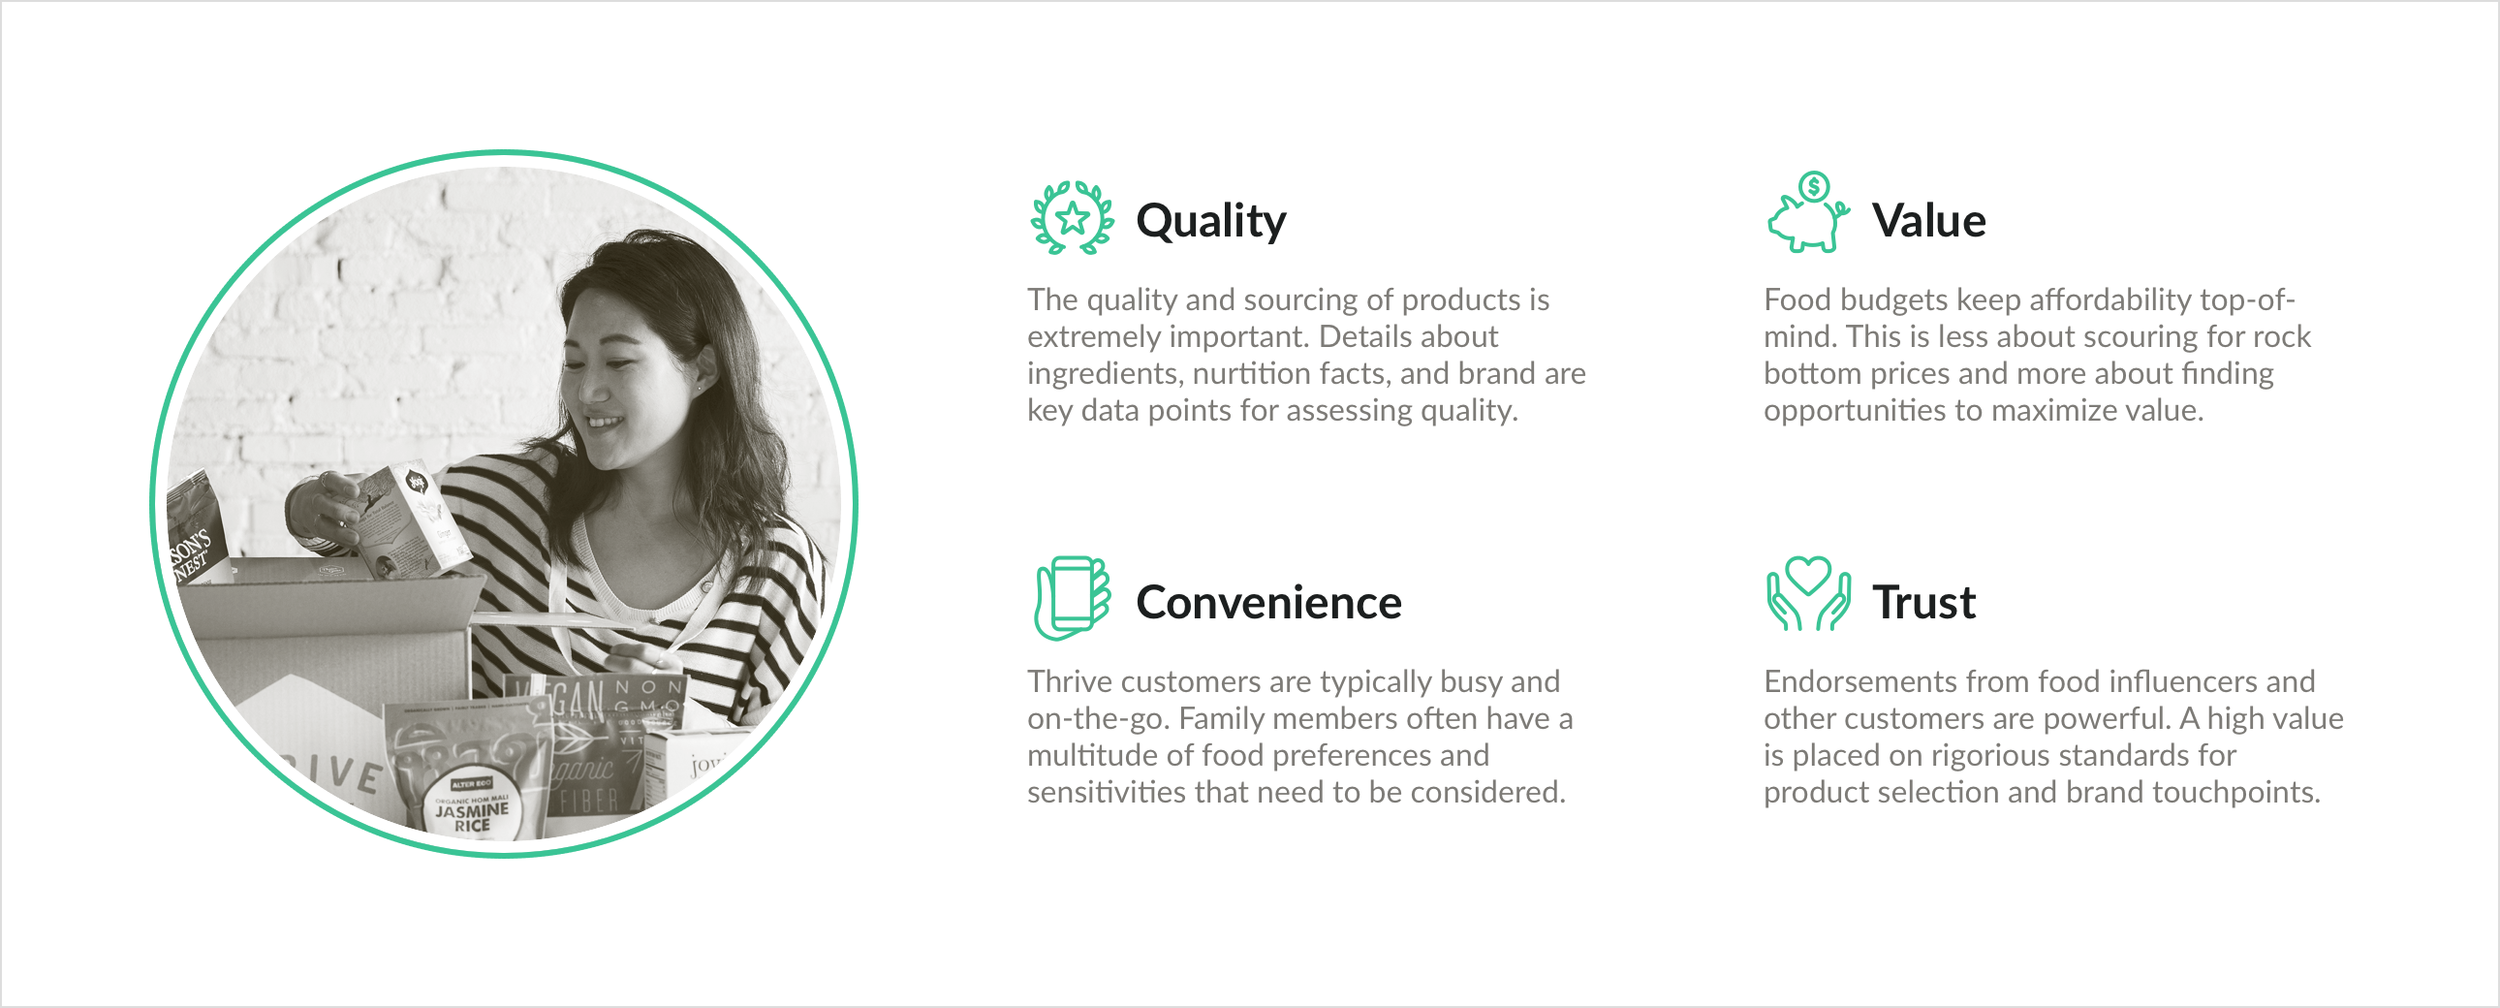 Snapshot of Thrive customer core values